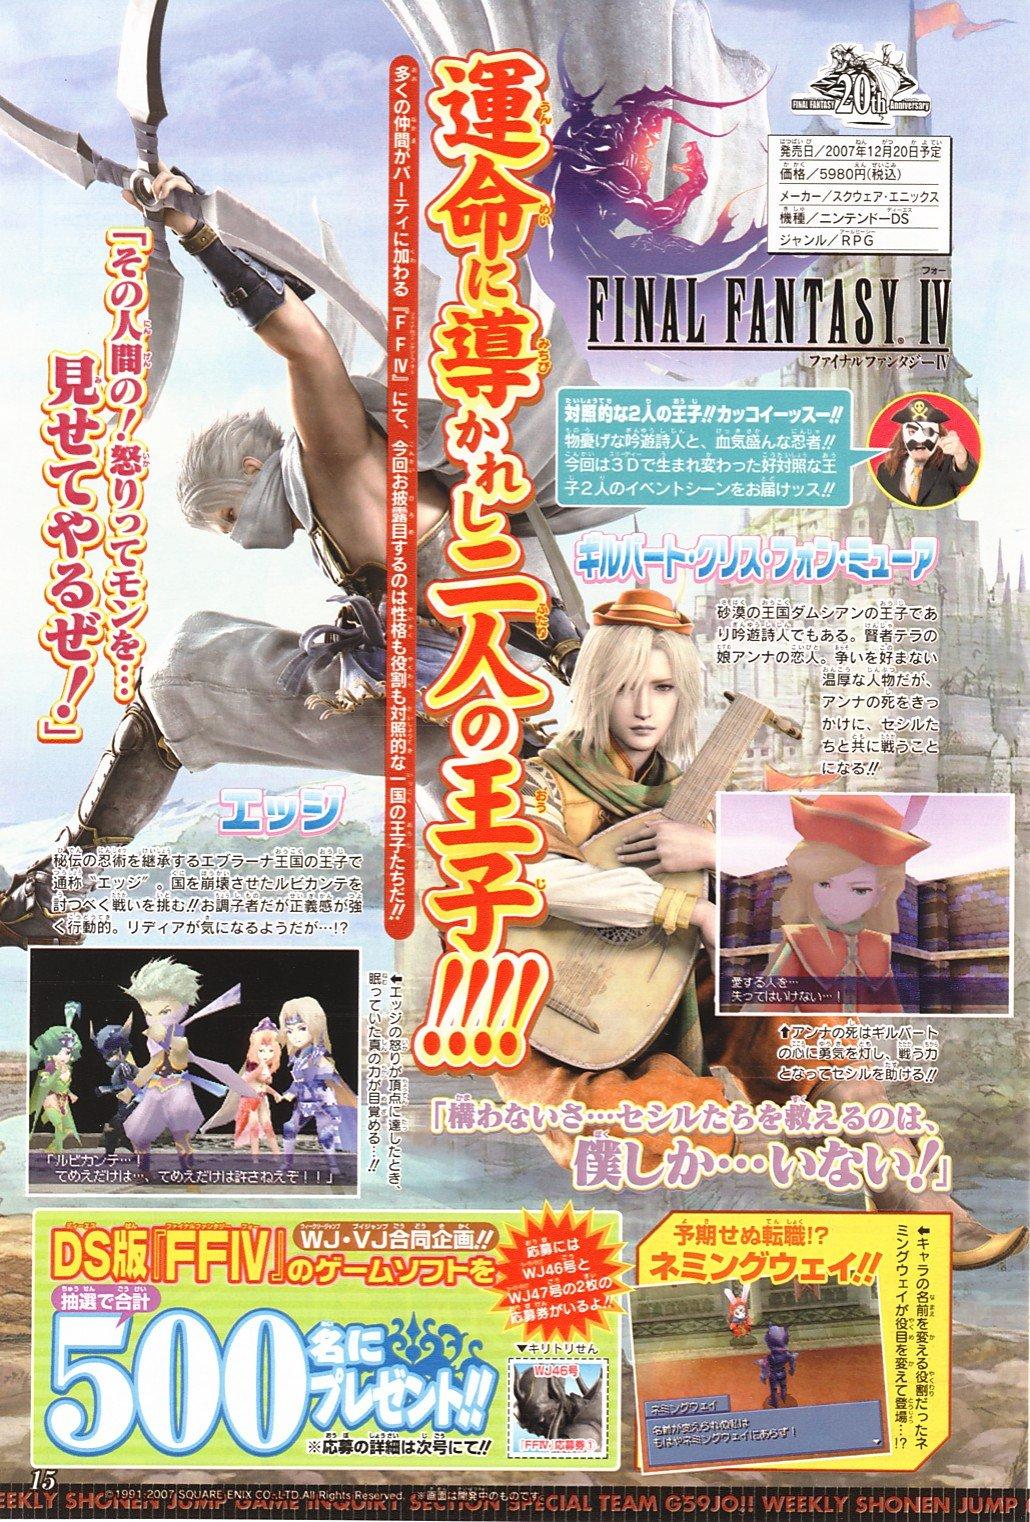 Final Fantasy IV: Deux princes